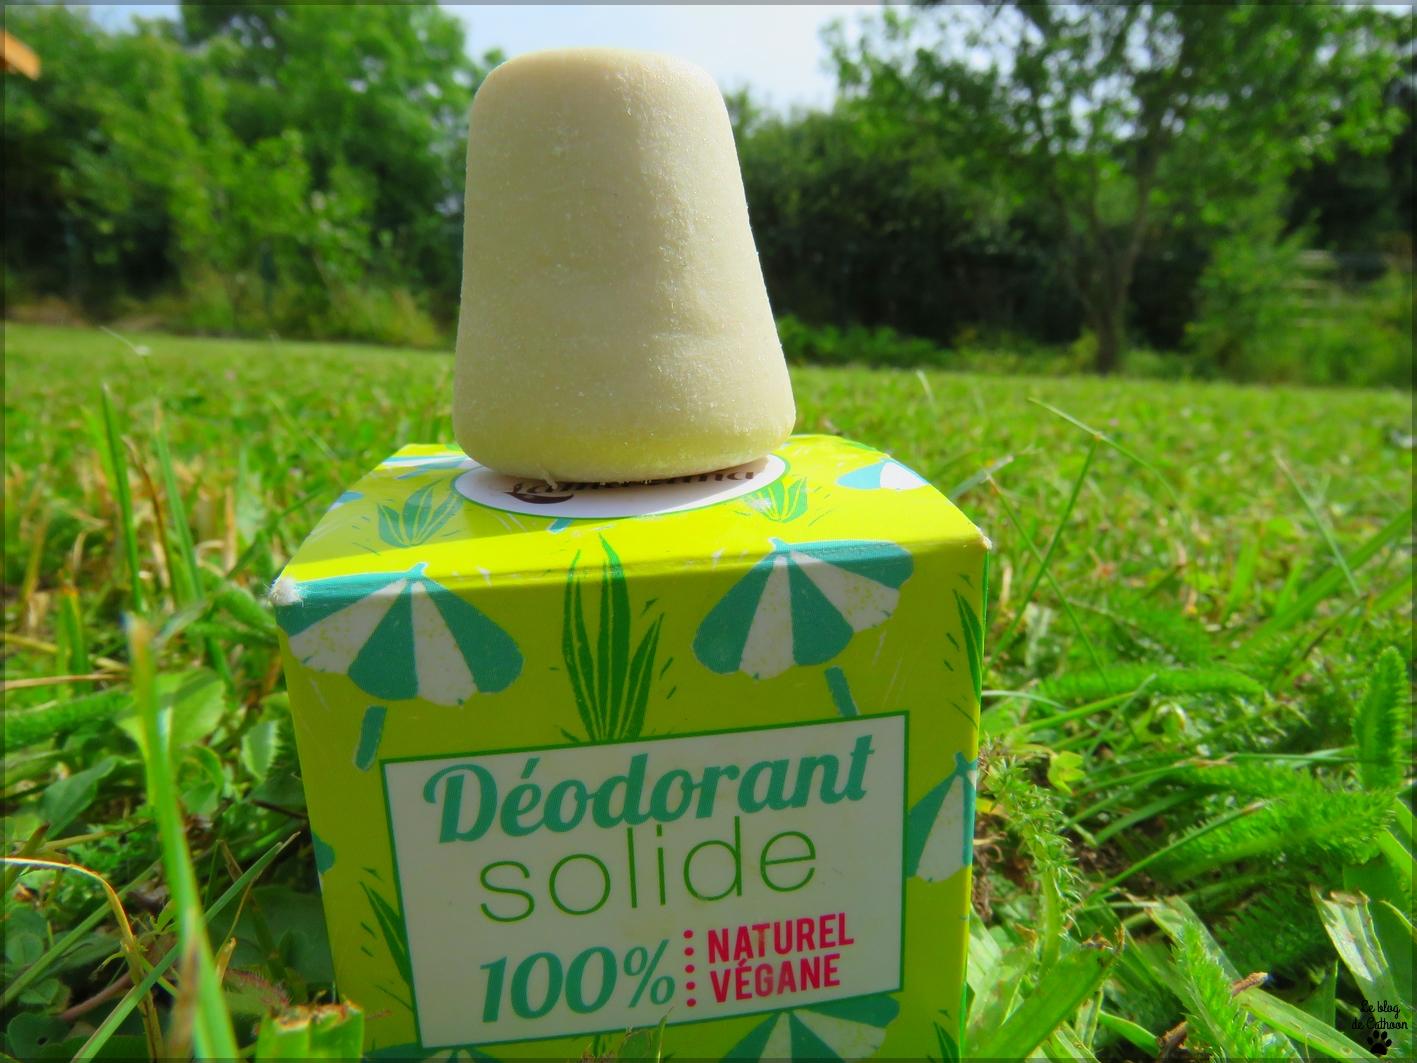 Déodorant Solide - 100% Naturel & Végane - Lamazuna